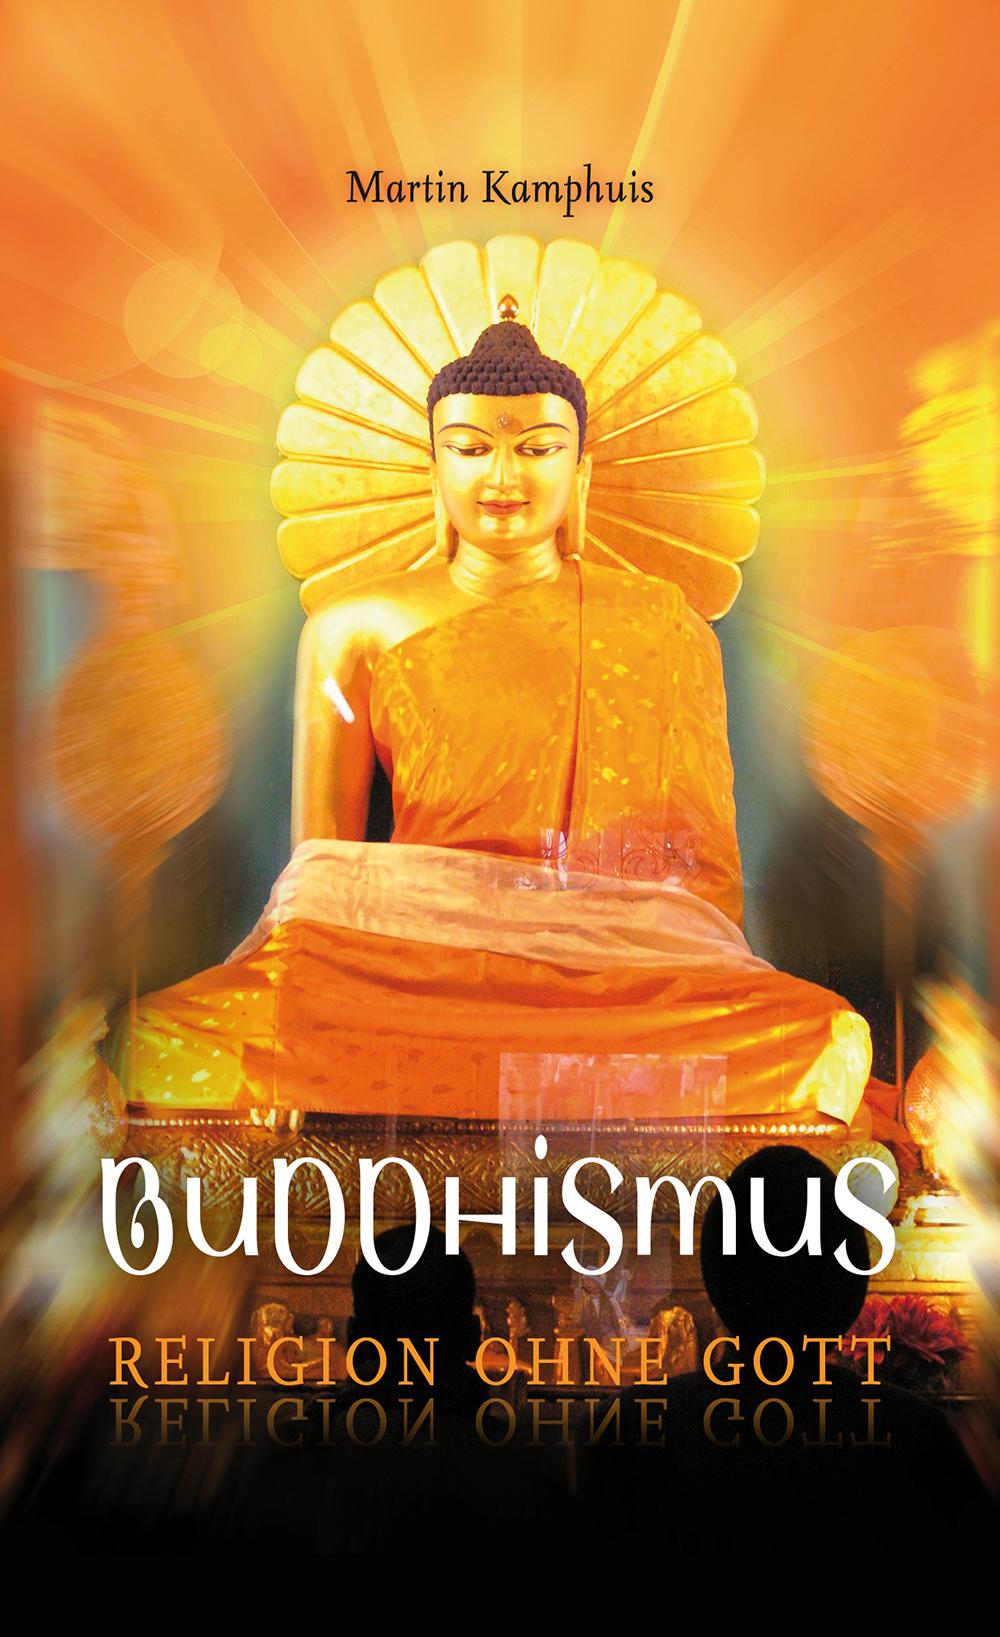 CLV_buddhismus-religion-ohne-gott_martin-kamphuis_256156_1